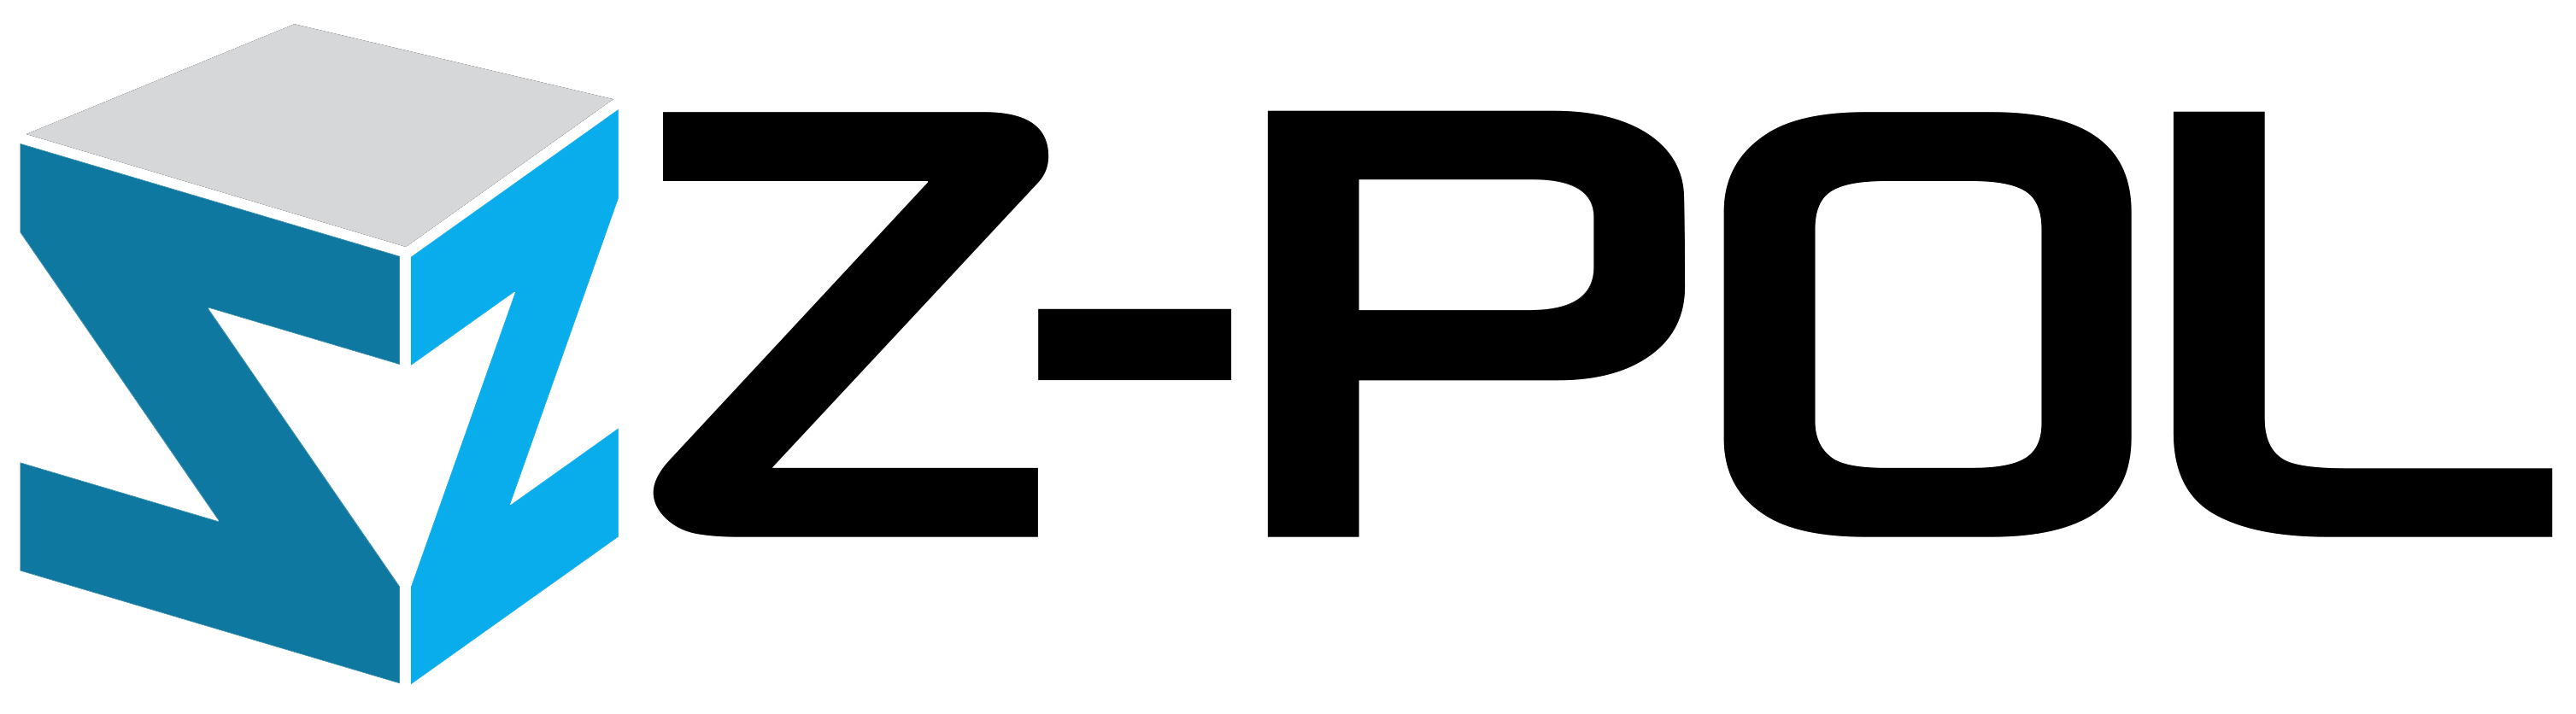 Z-pol